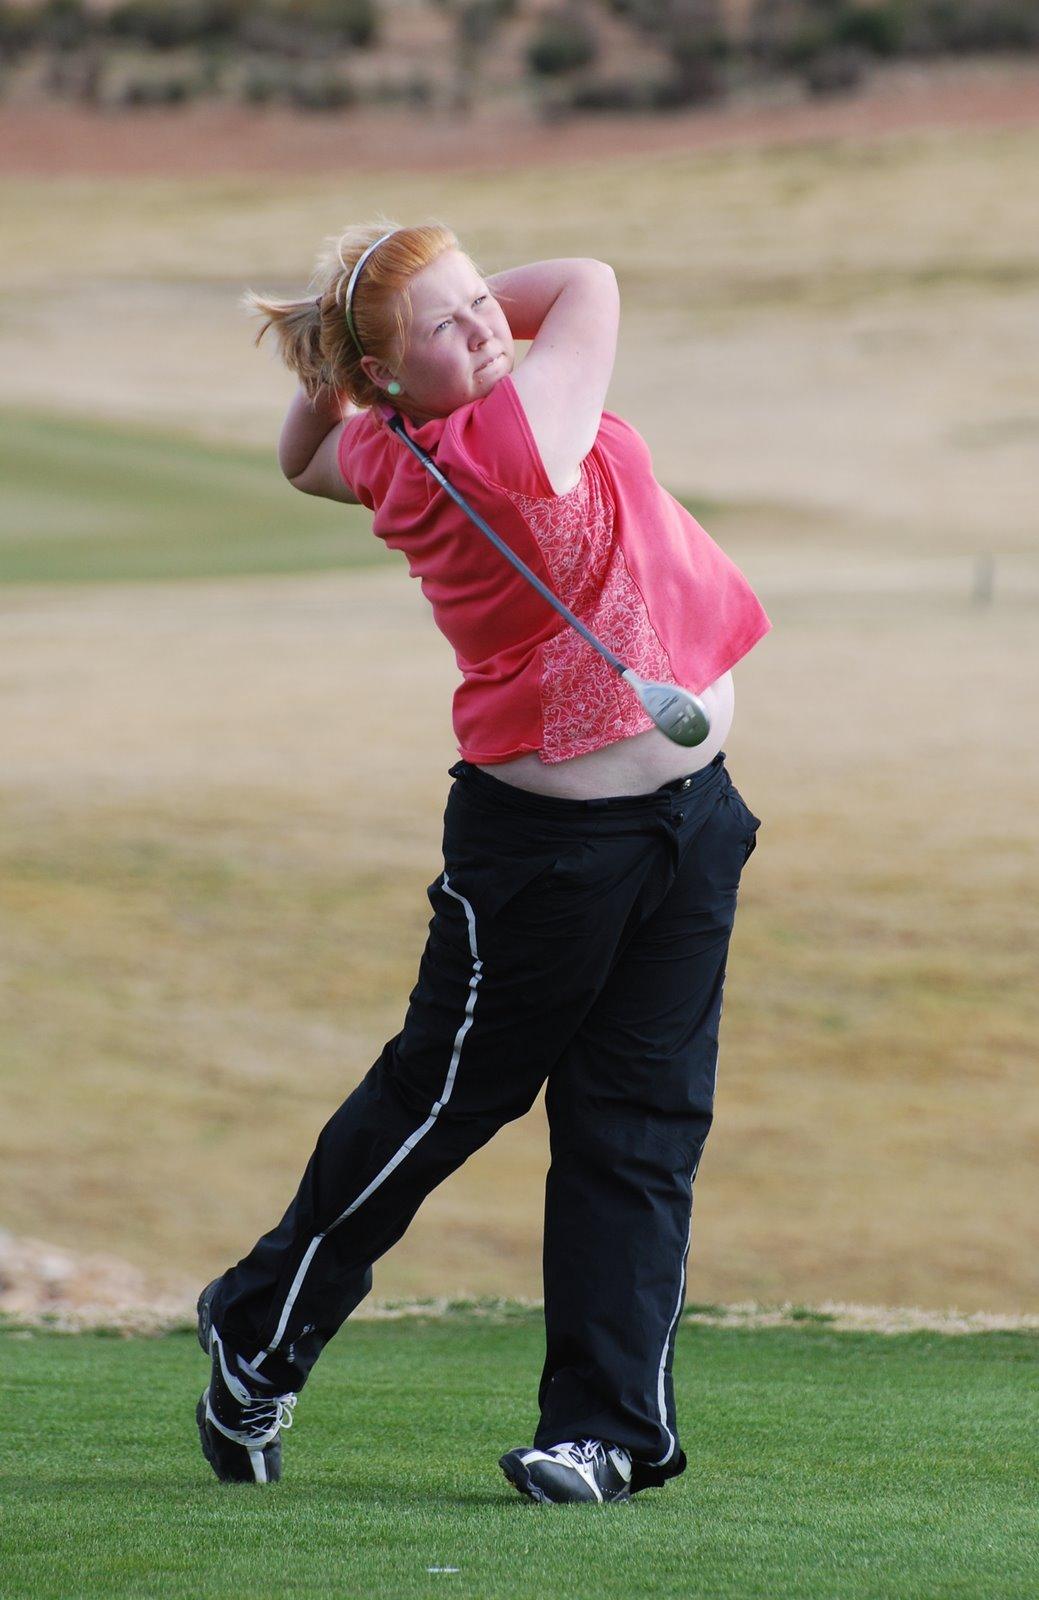 Belinda kerr golf